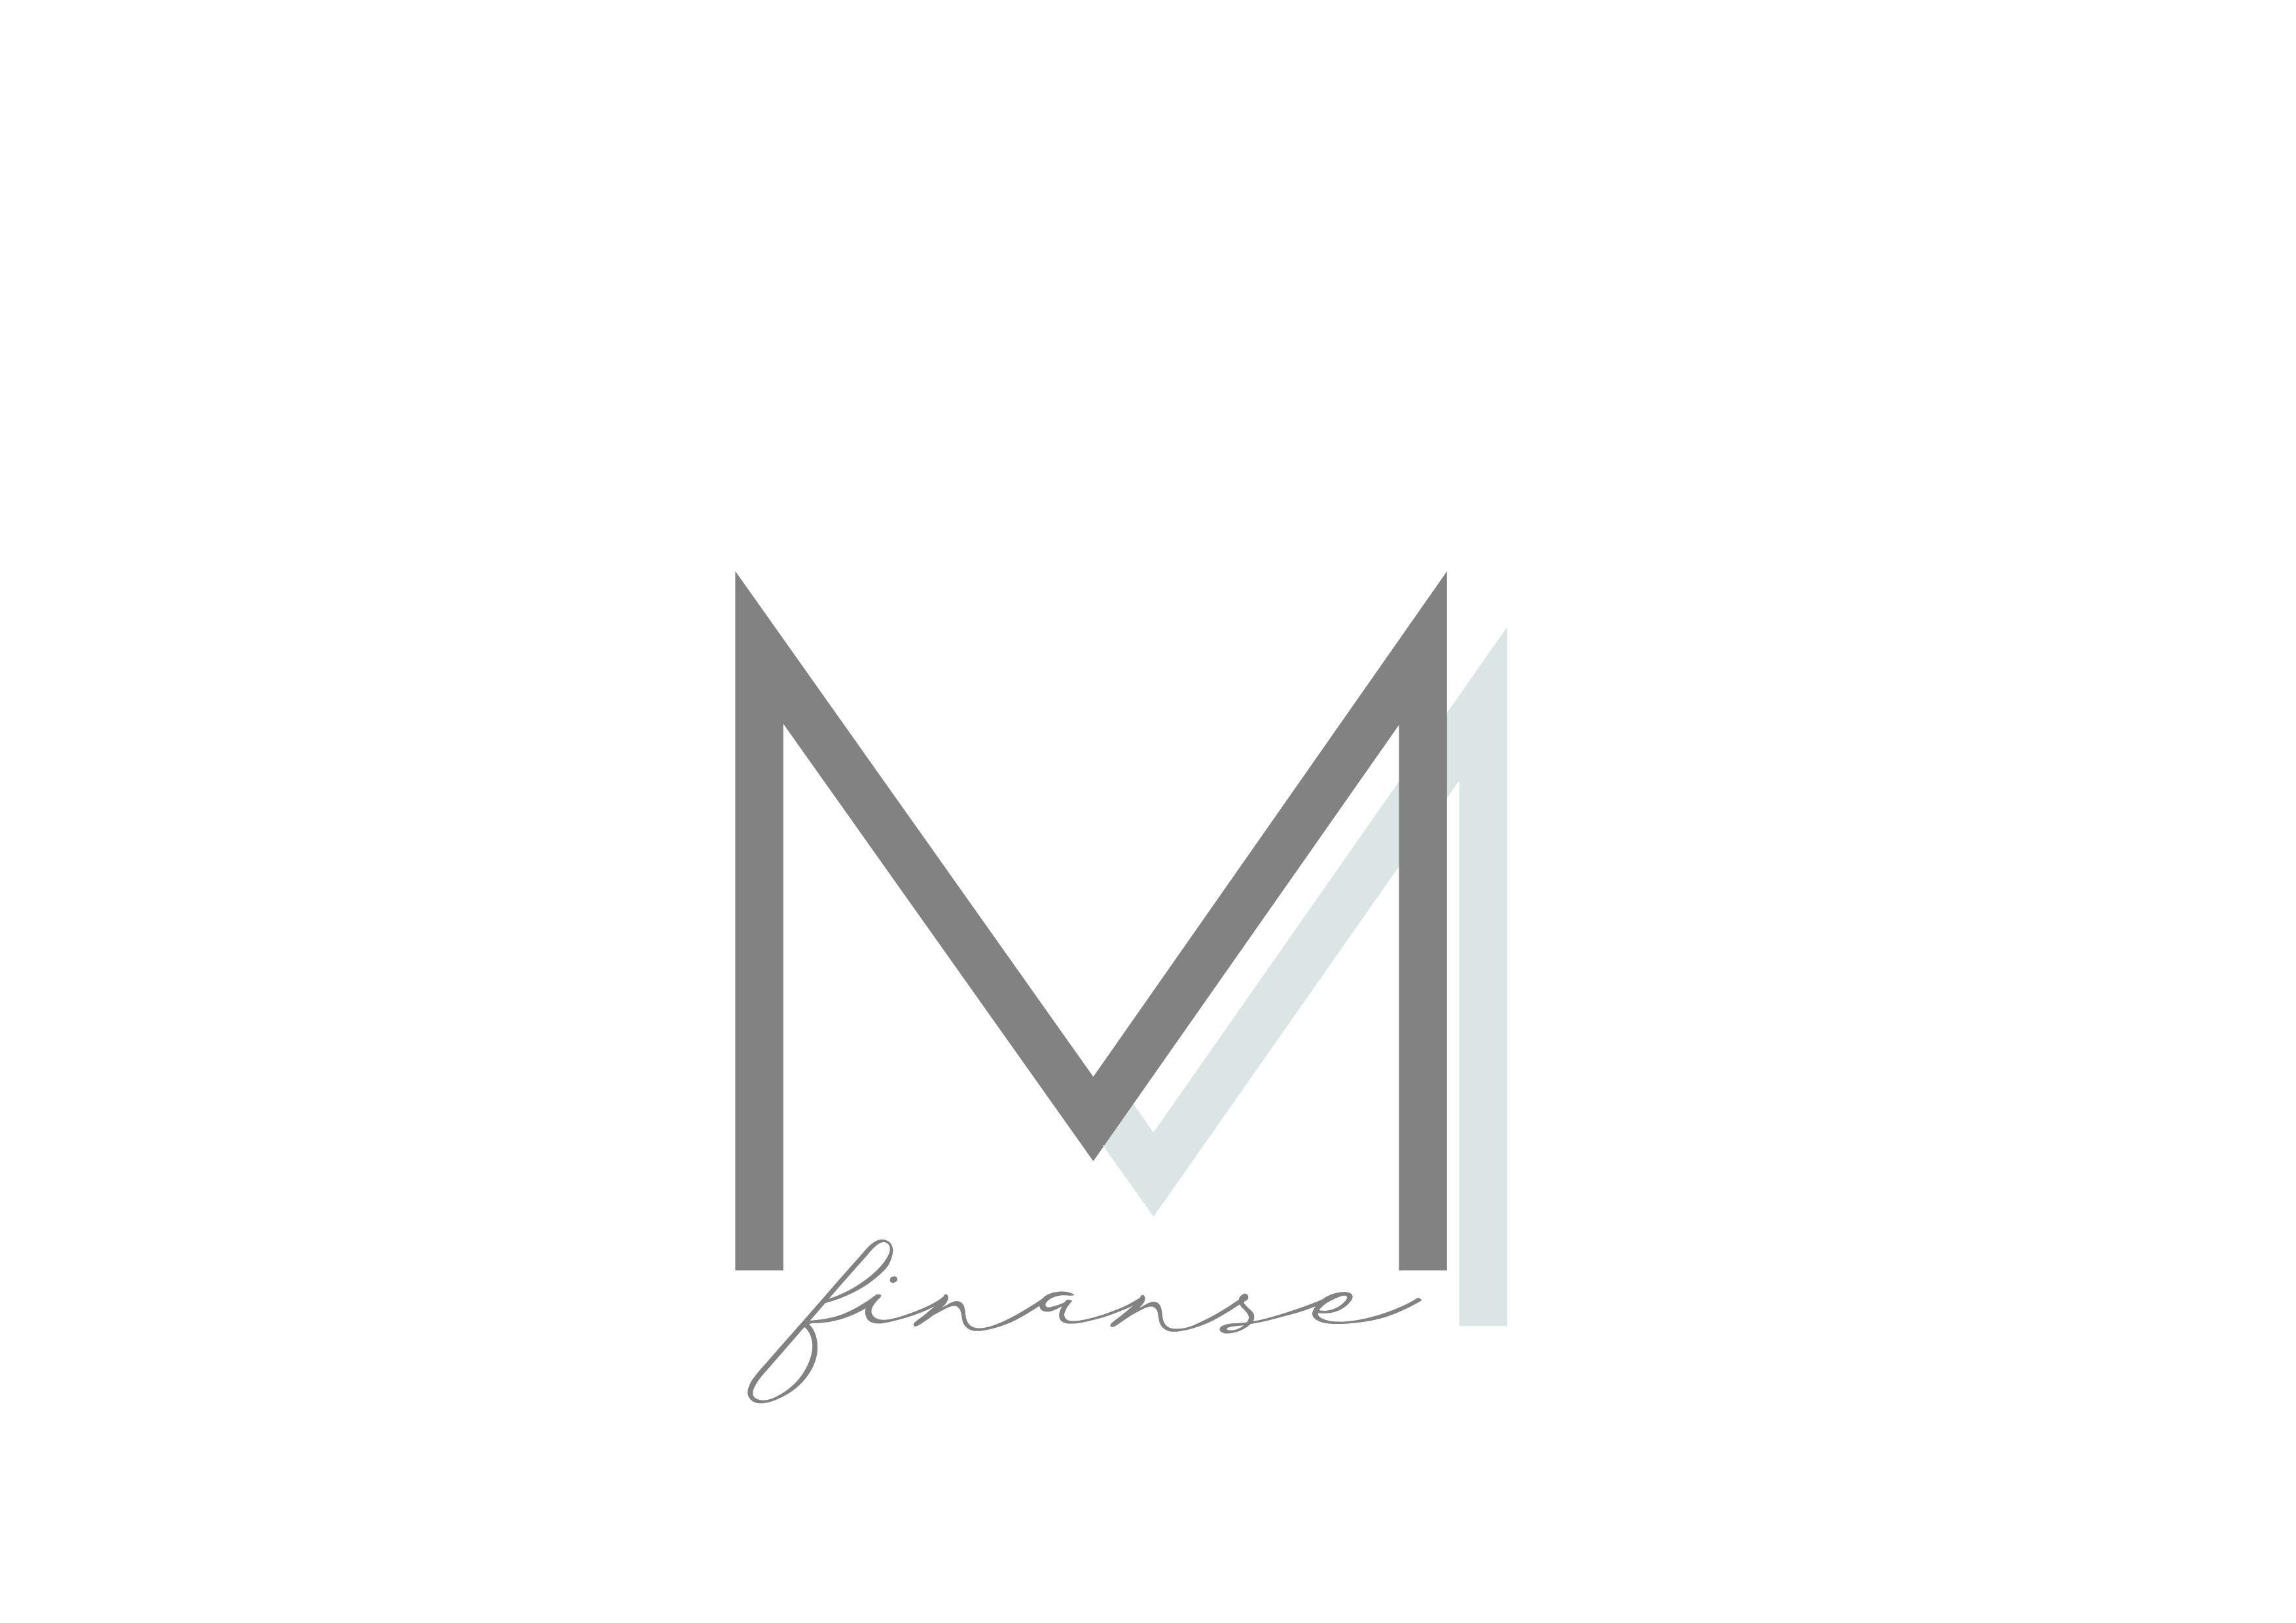 LOGO - MM finanse